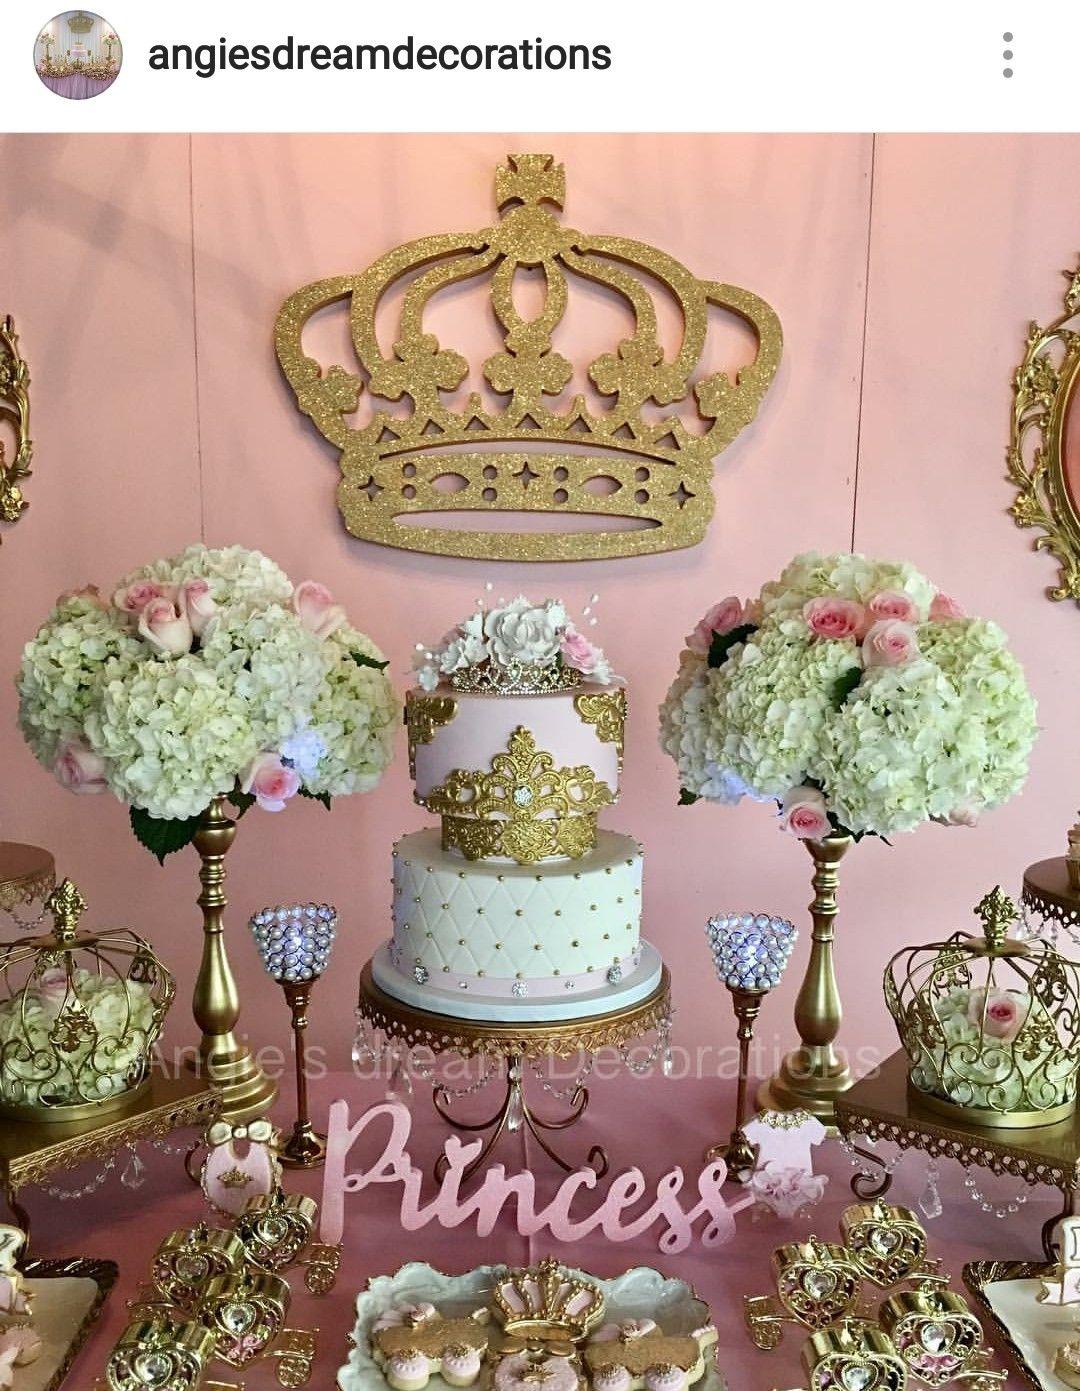 Princess Theme Baby Shower Dessert Table Decor Girl Baby Shower Decorations Royal Baby Shower Theme Girl Girl Shower Decorations